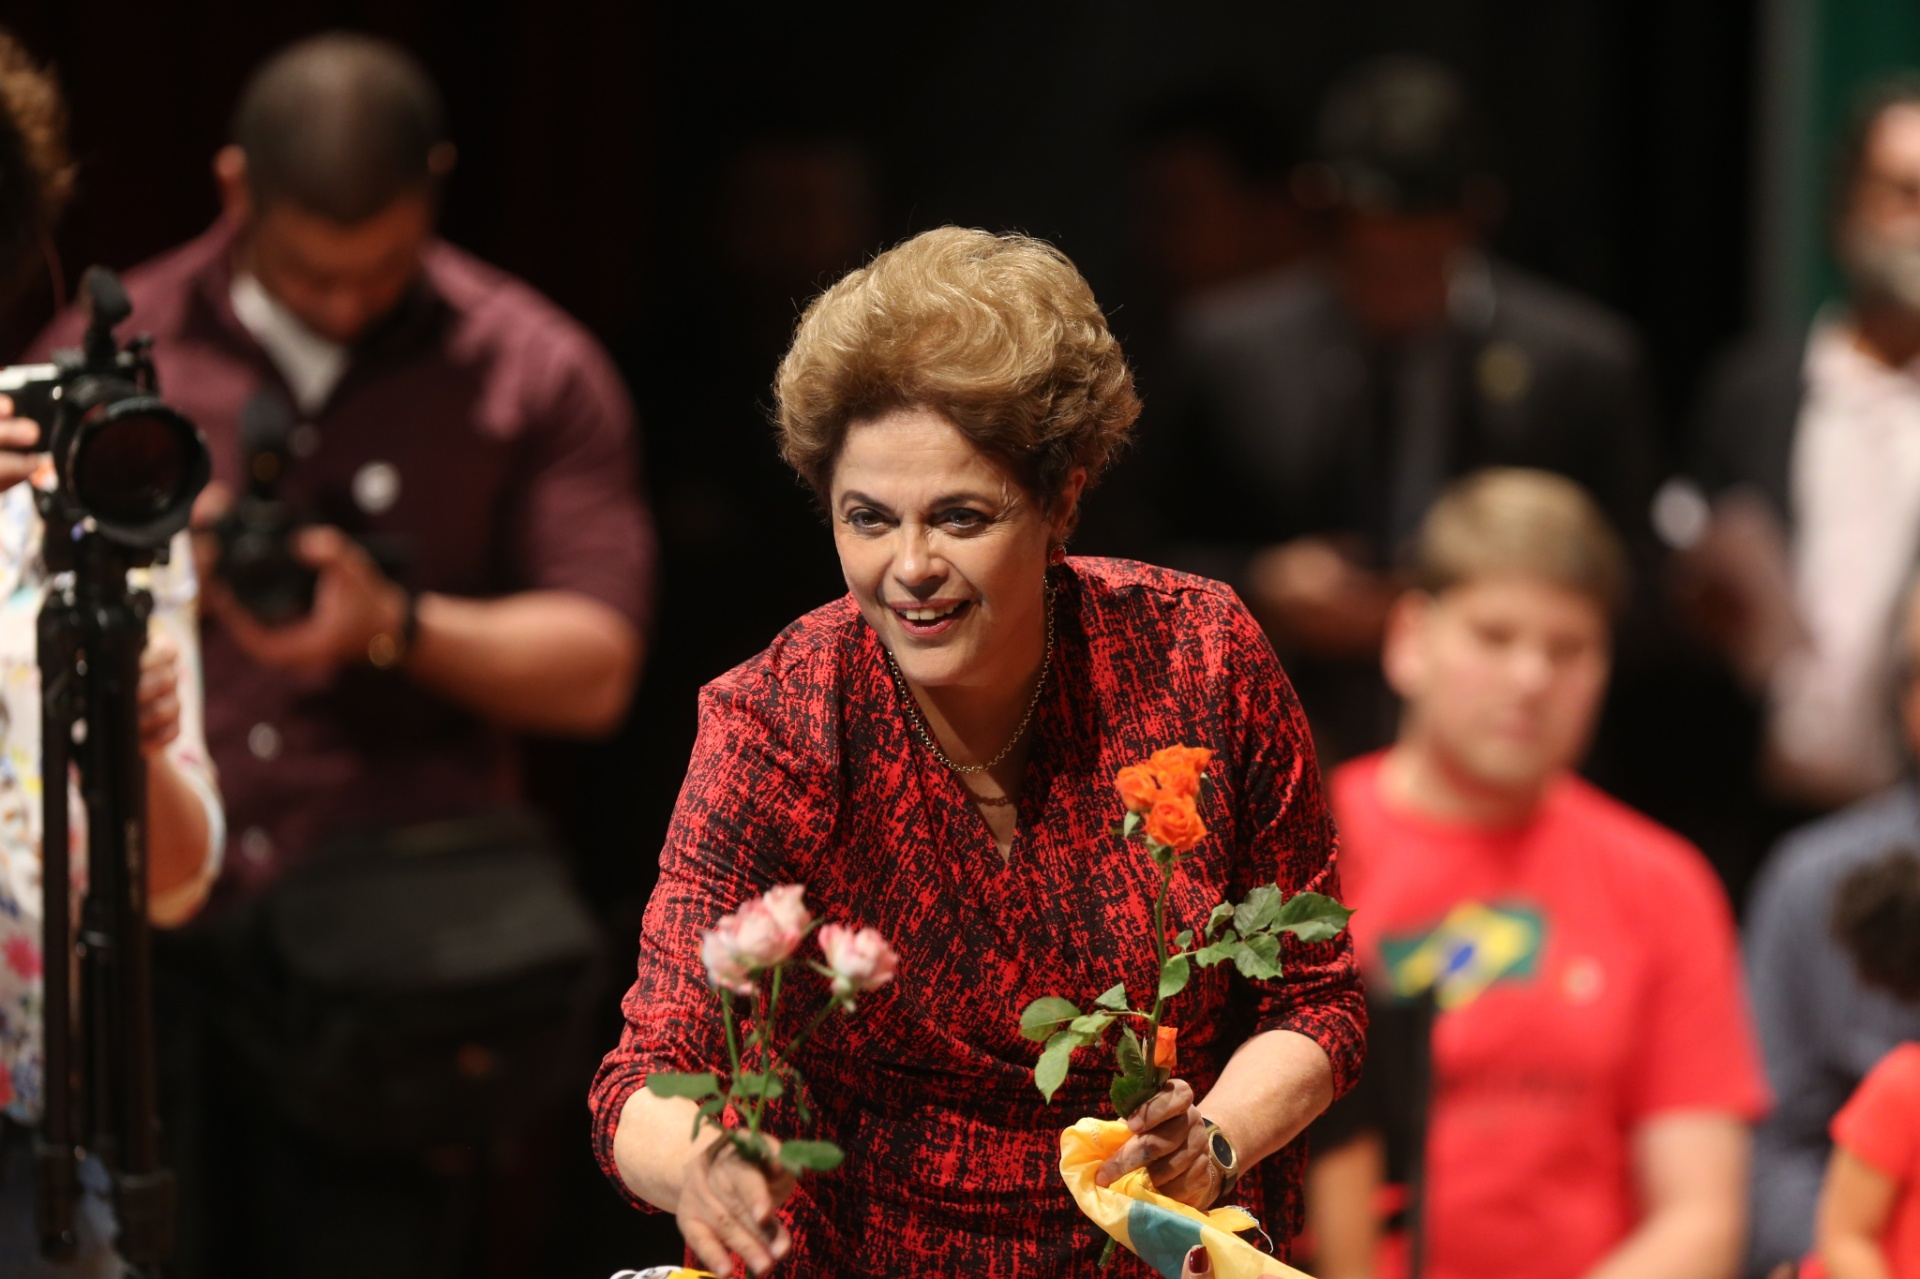 24.ago.2016 - A presidente Dilma Rousseff recebe flores de militantes no Teatro dos Bancários, em Brasília, onde foi realizado o seu provável último ato públicoantes do julgamento de seu impeachment